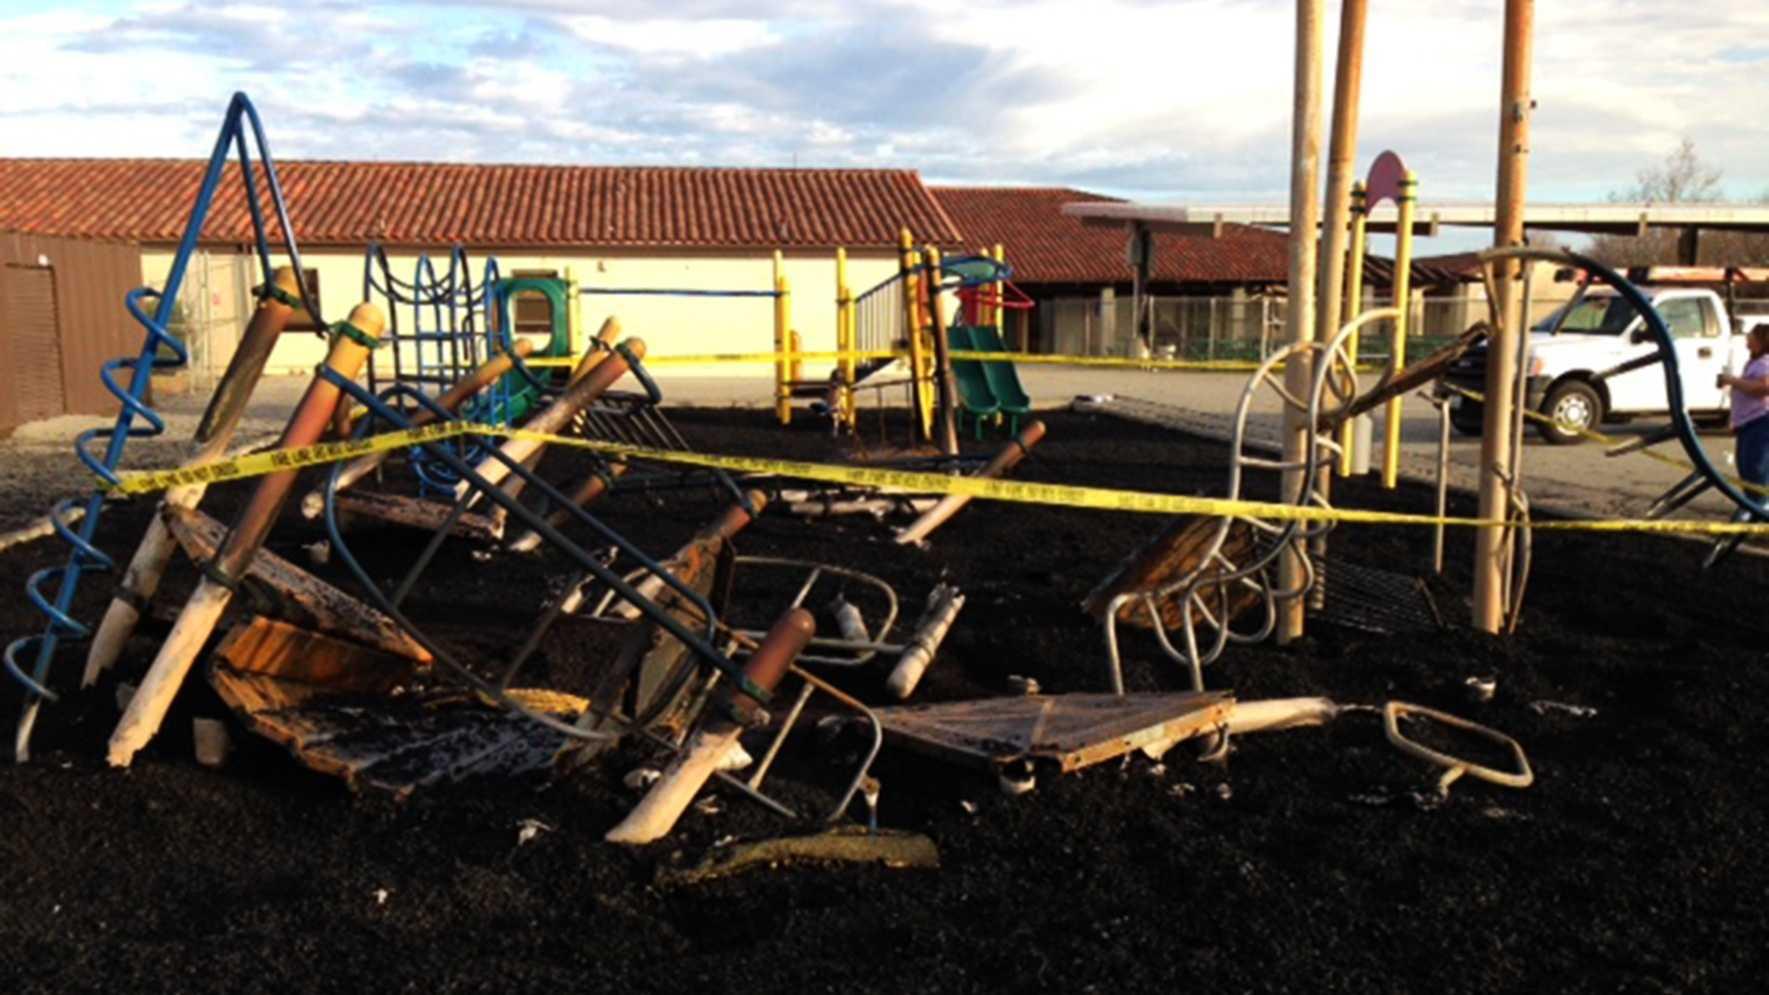 Calaveras Elementary School's playground was burned to the ground.